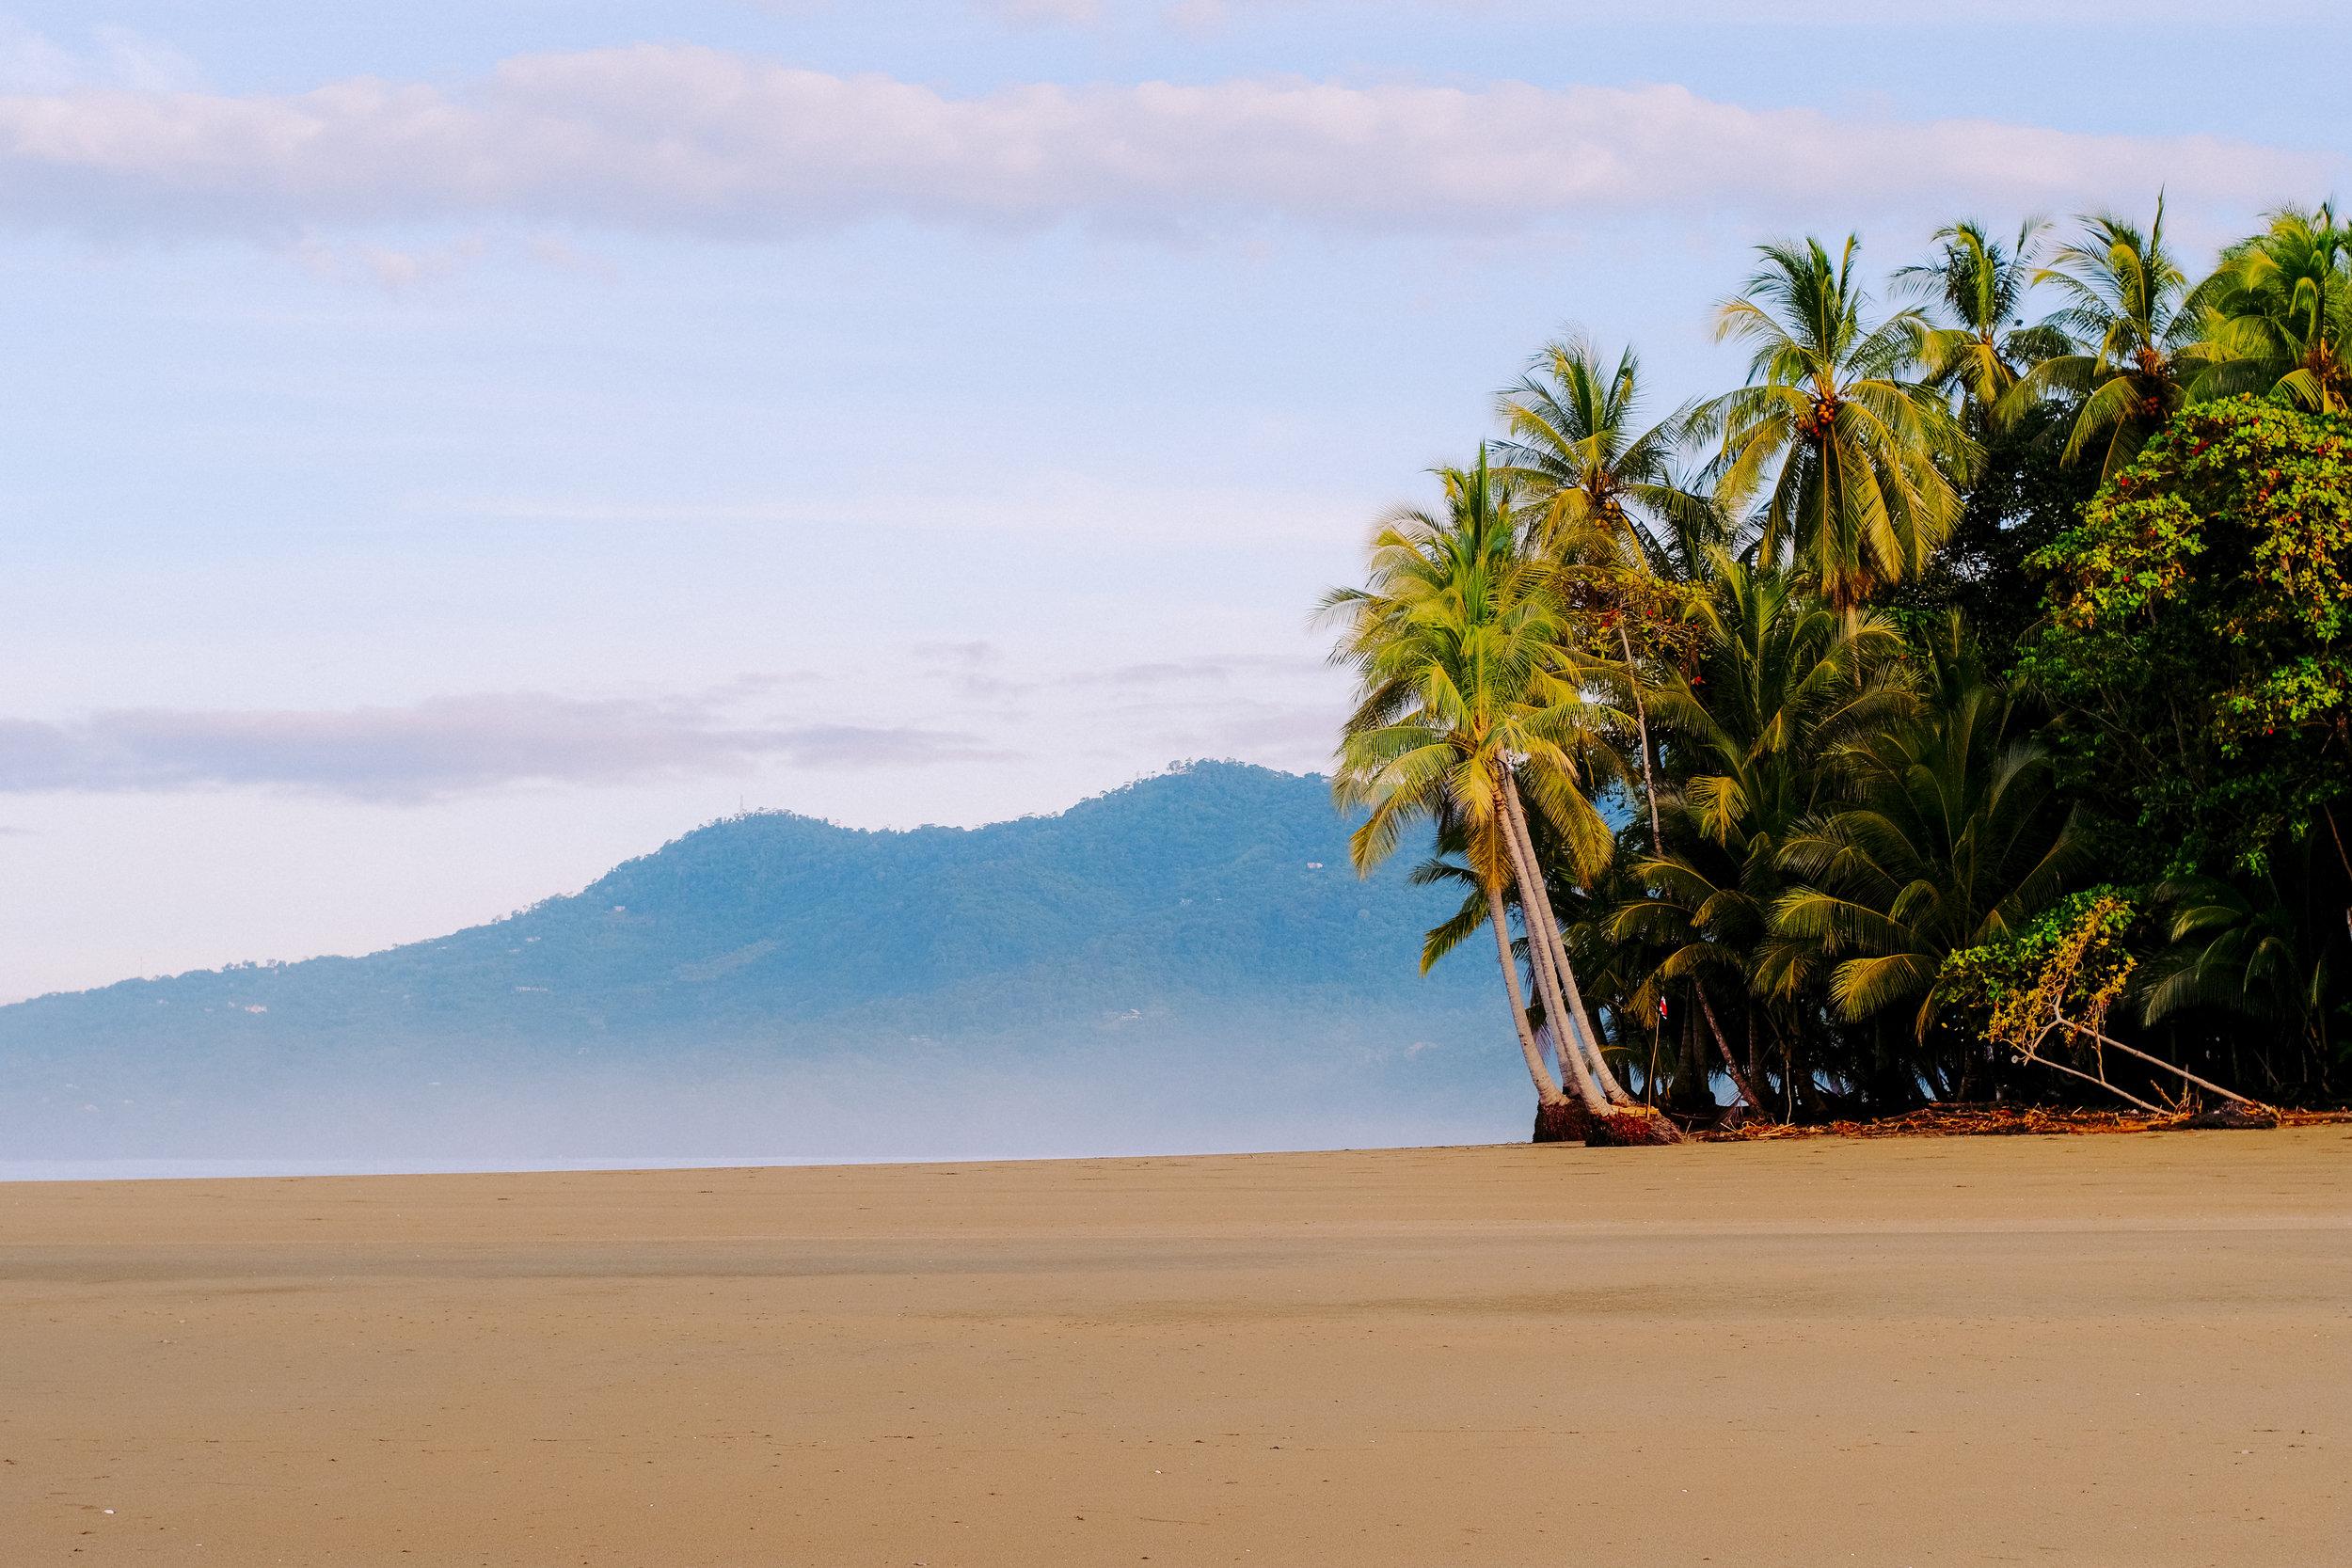 BBP-Costa Rica2018-54.jpg